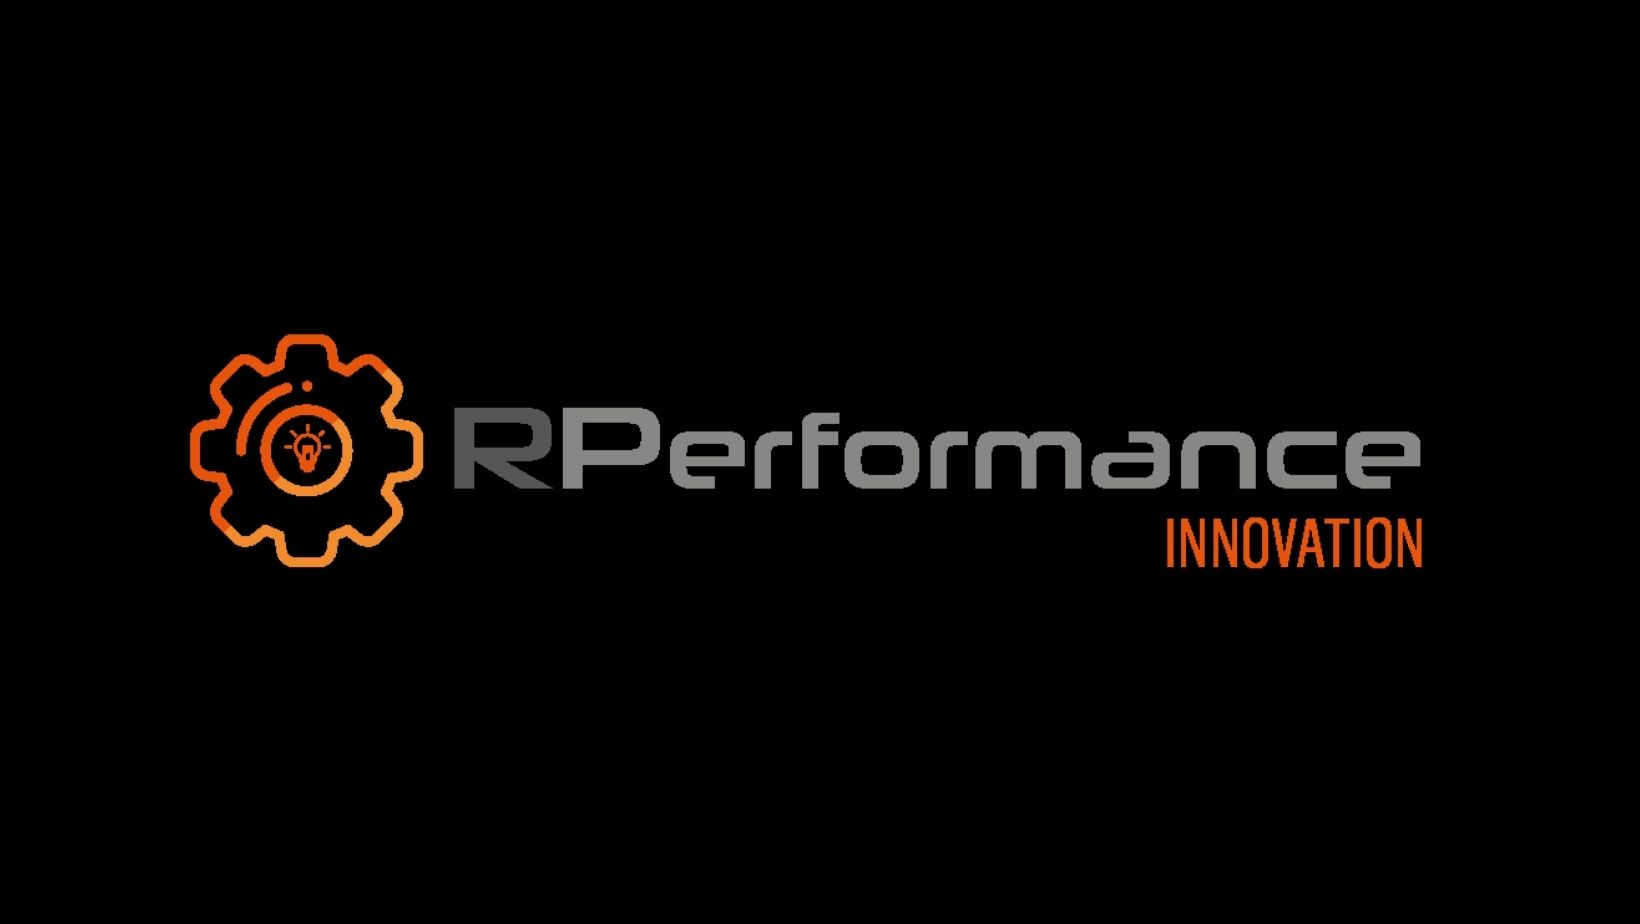 RP- Innovation